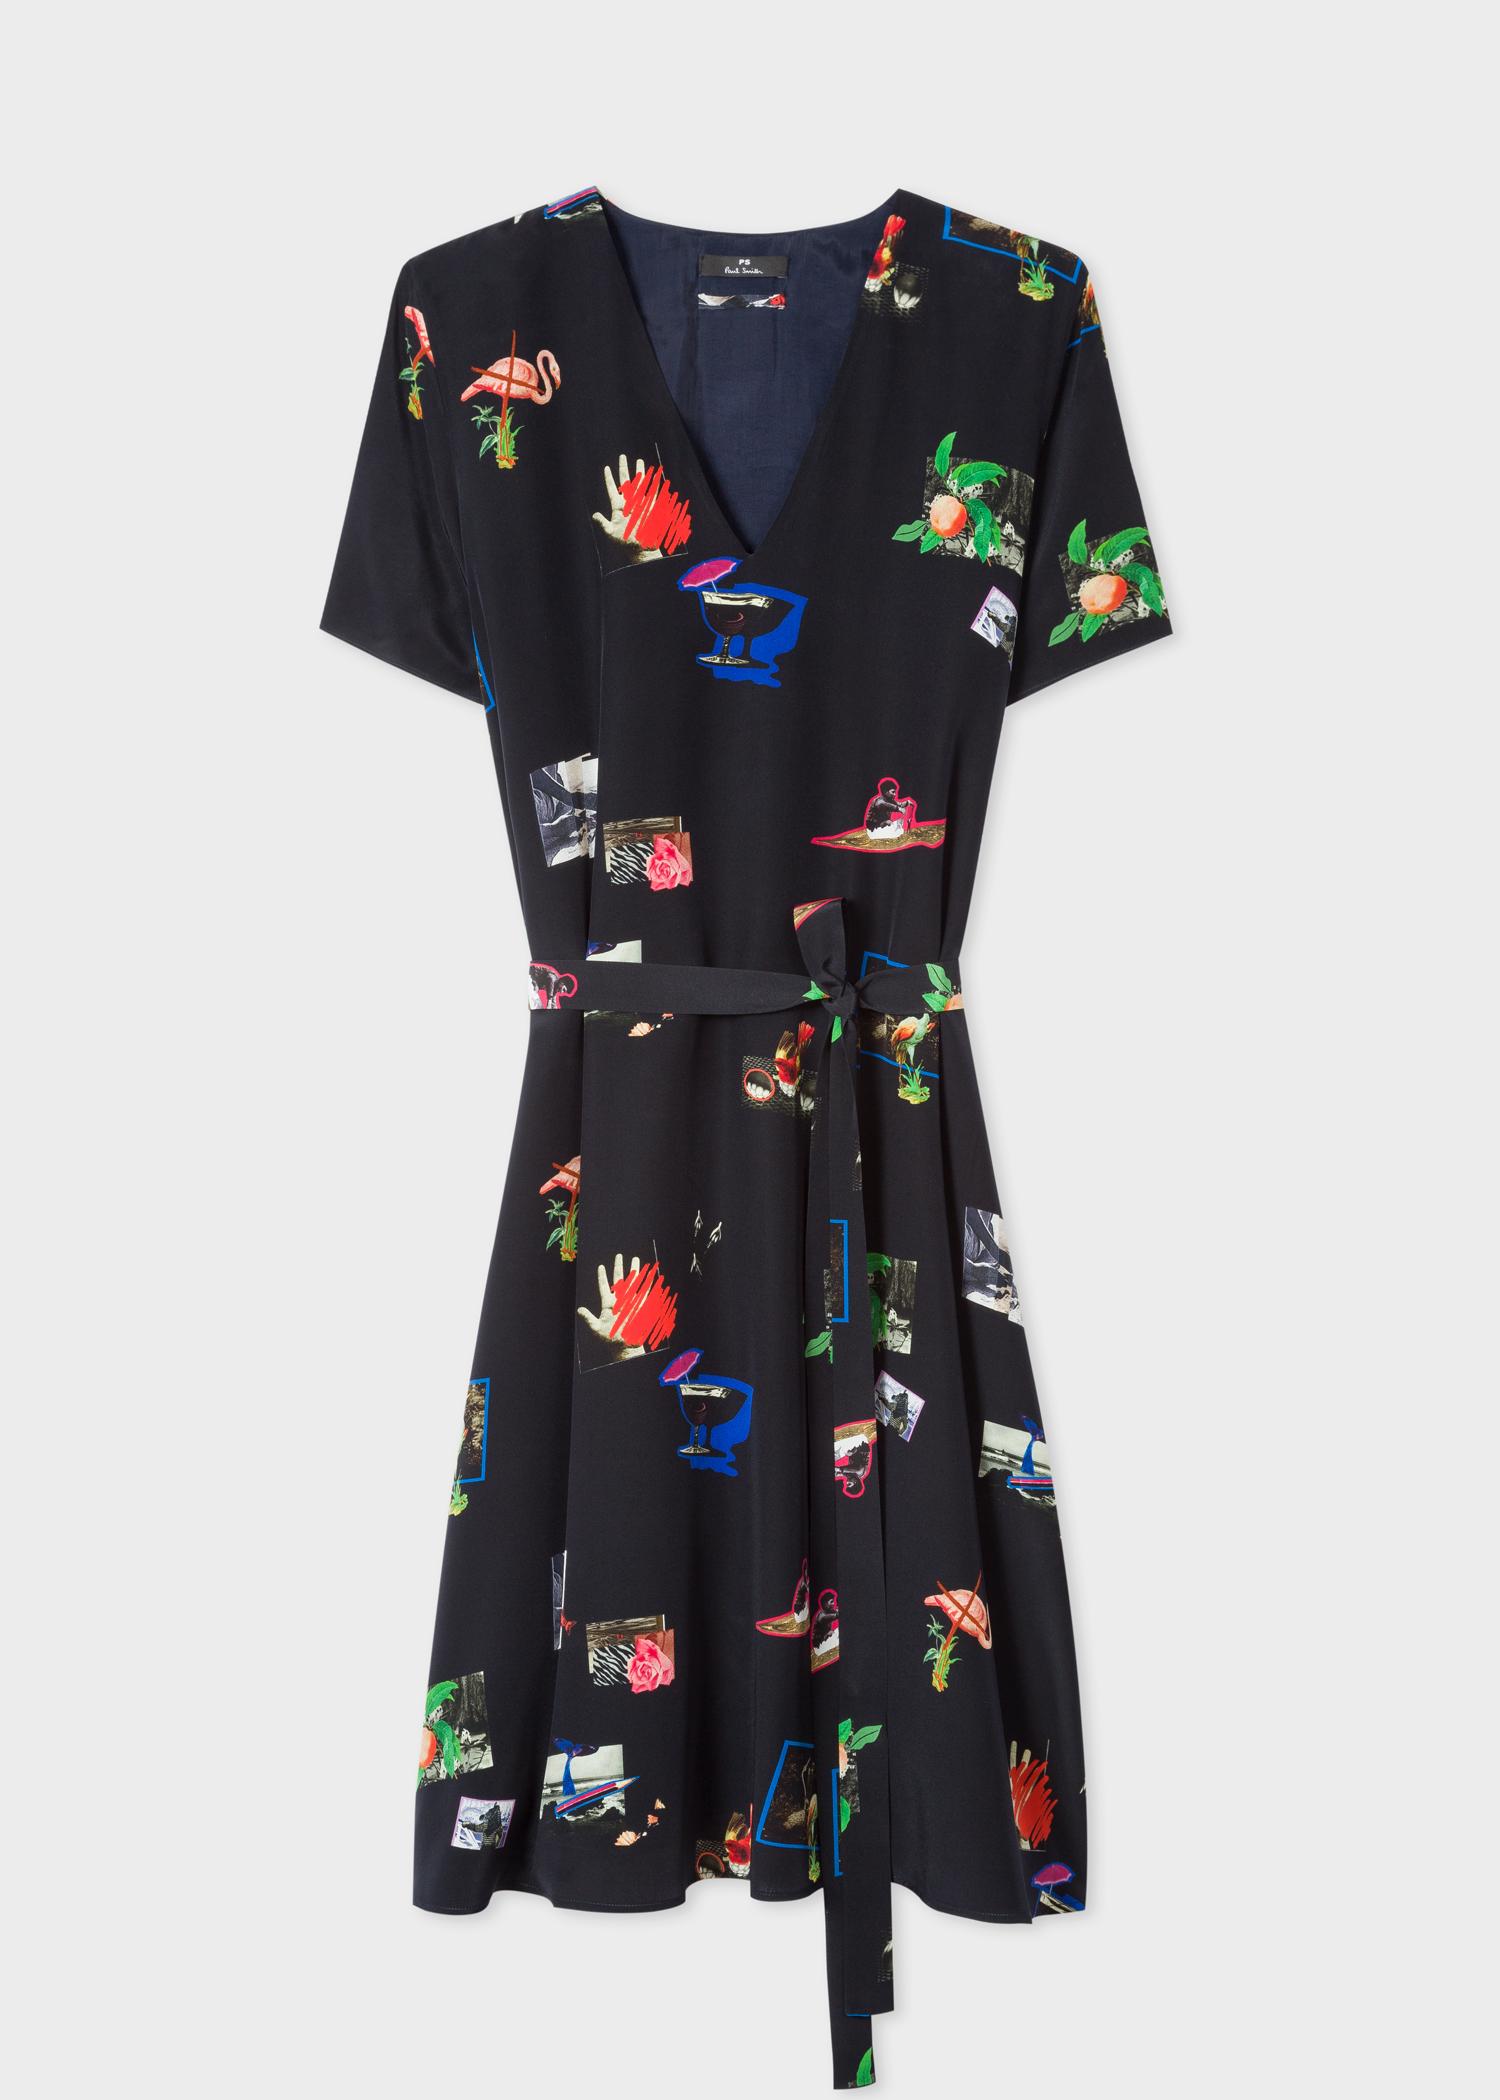 43efb757d3 Women s Dark Navy  Paul s Scrapbook  Print V-Neck Silk Dress - Paul ...